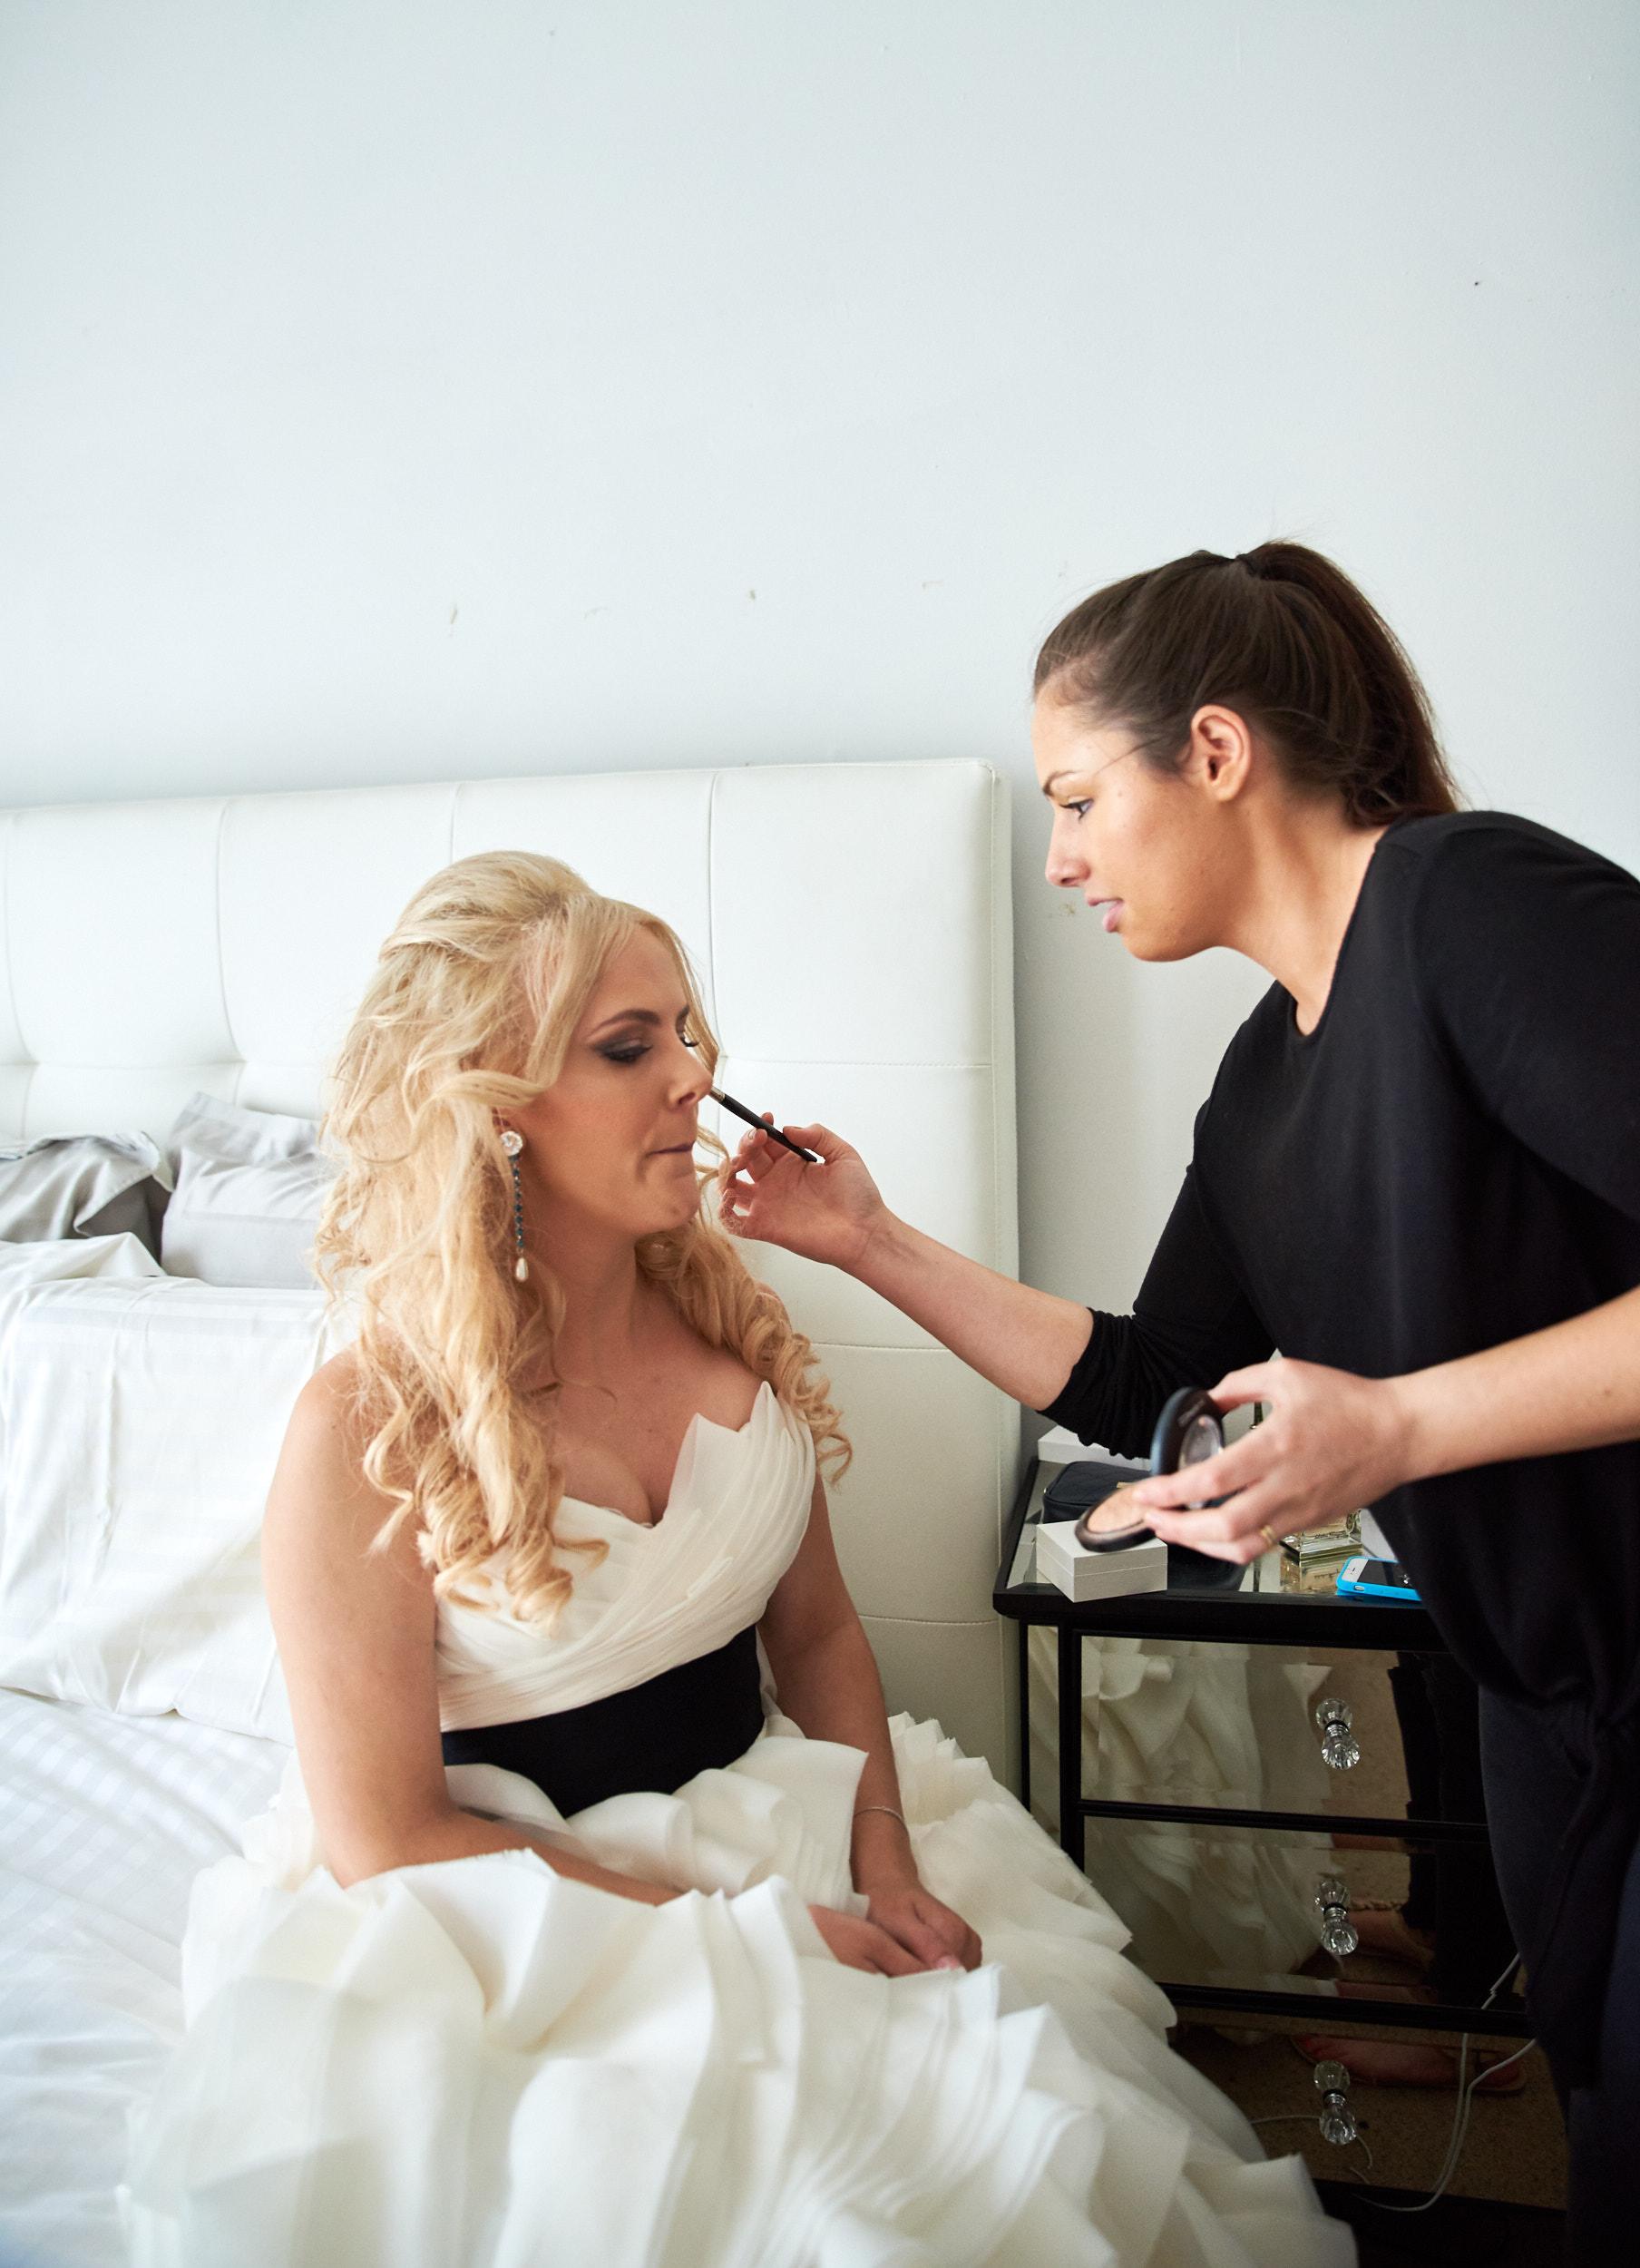 Makeup artist applying makeup to bride